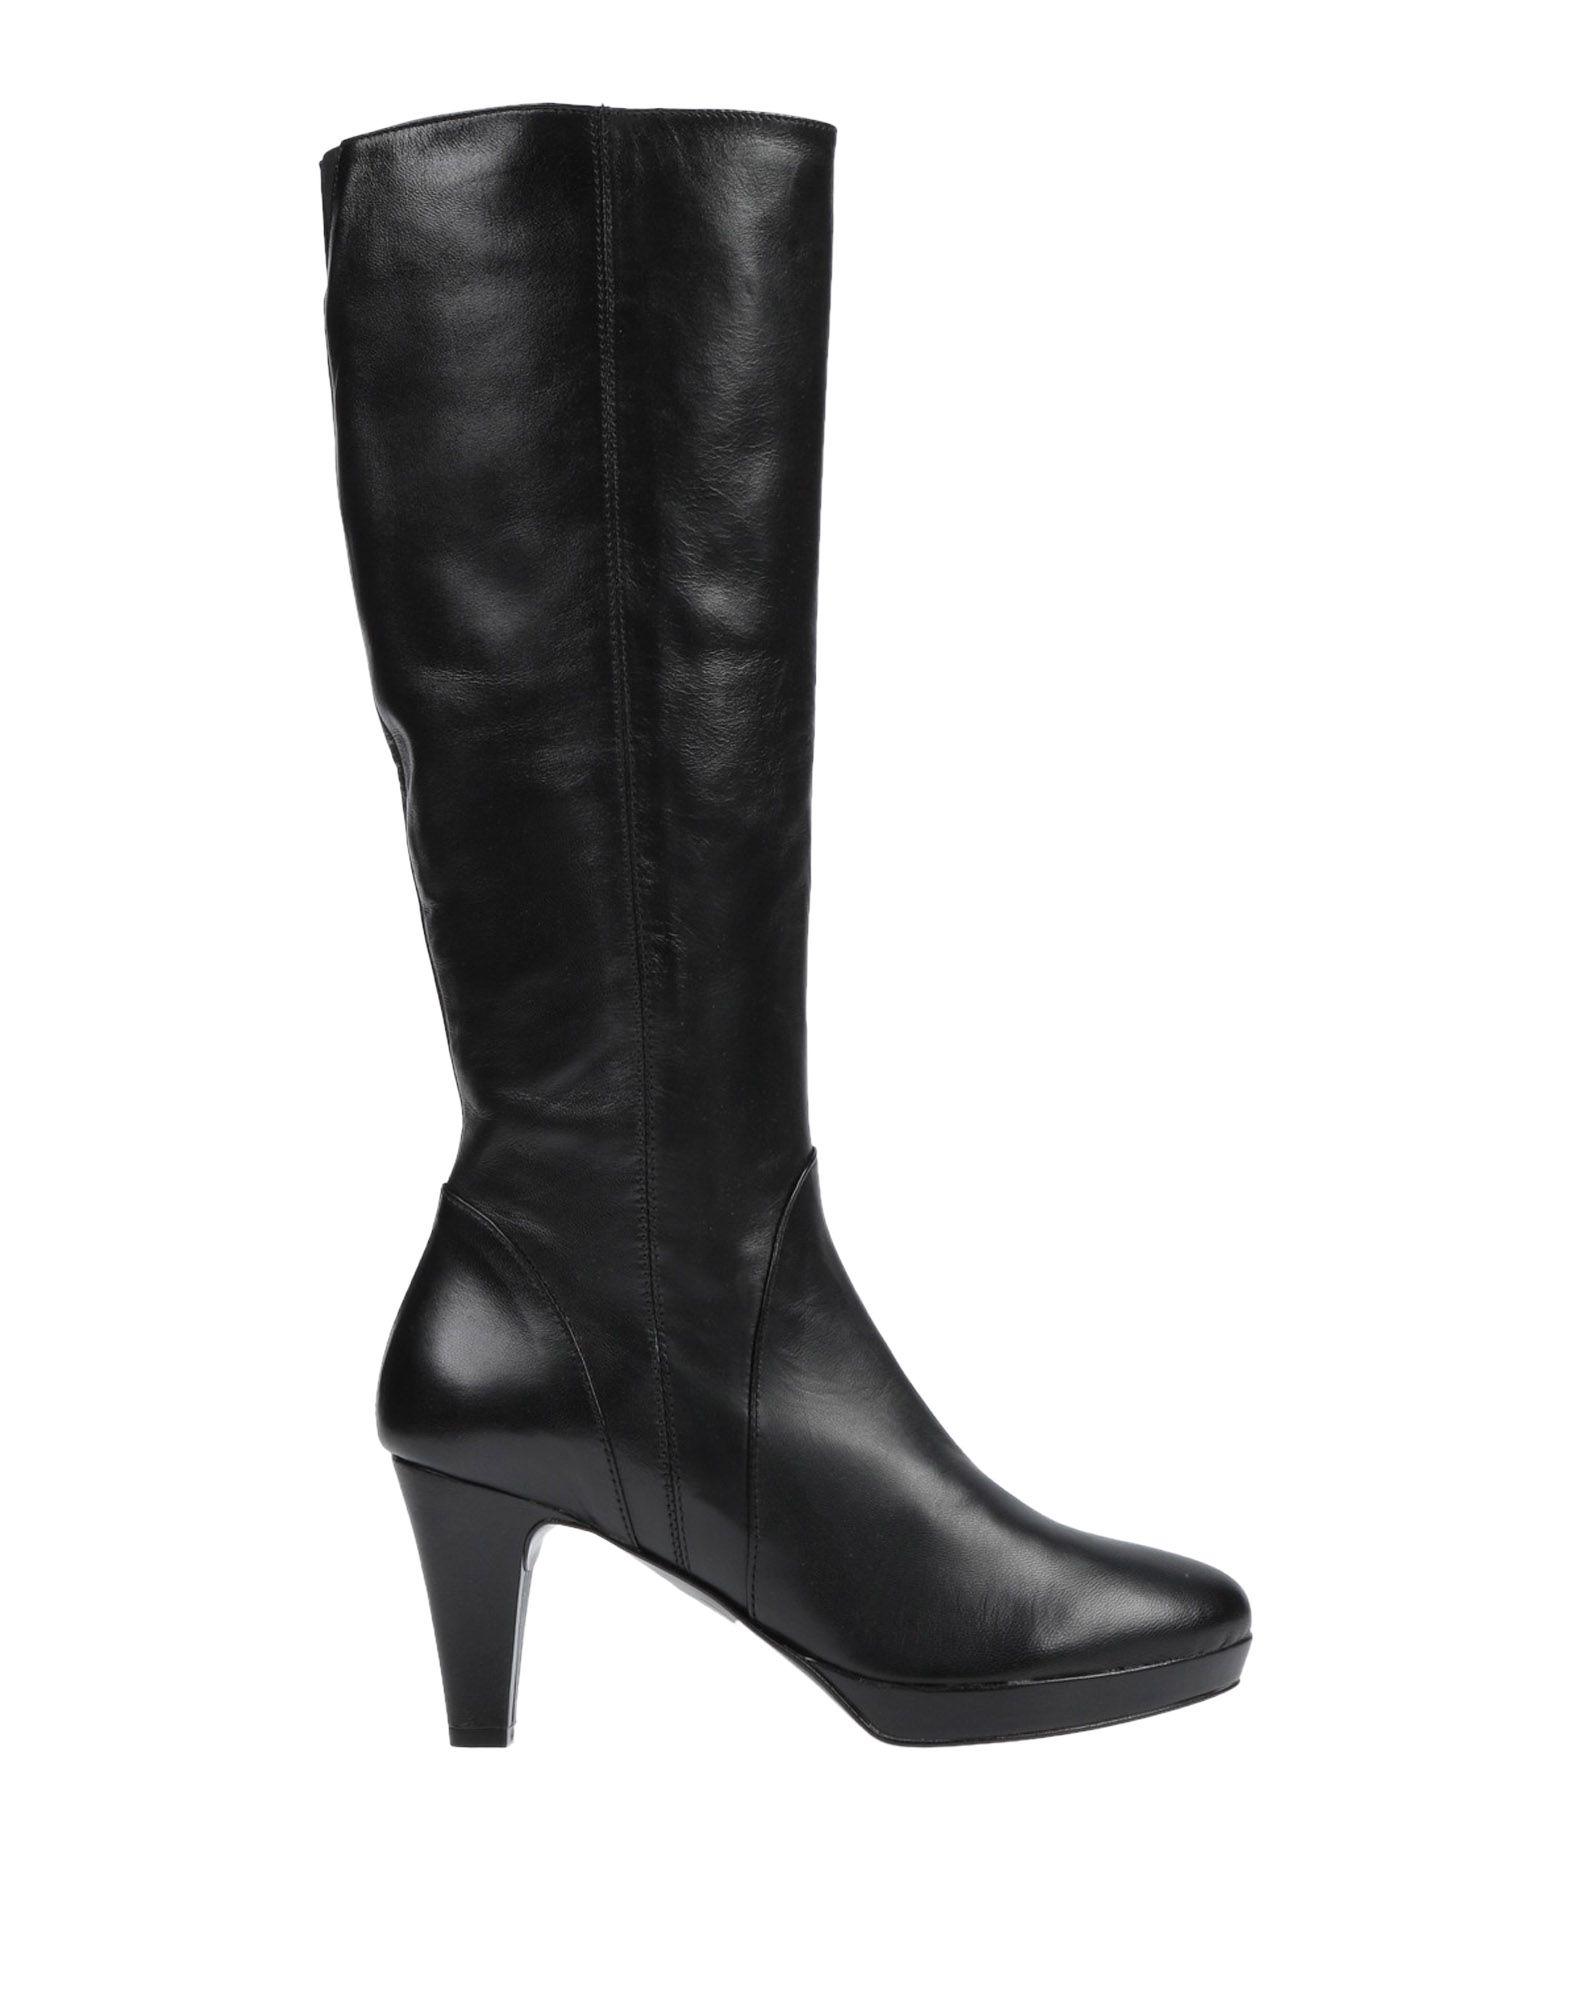 Stivali Chocolà Donna - 11526257JD elegante